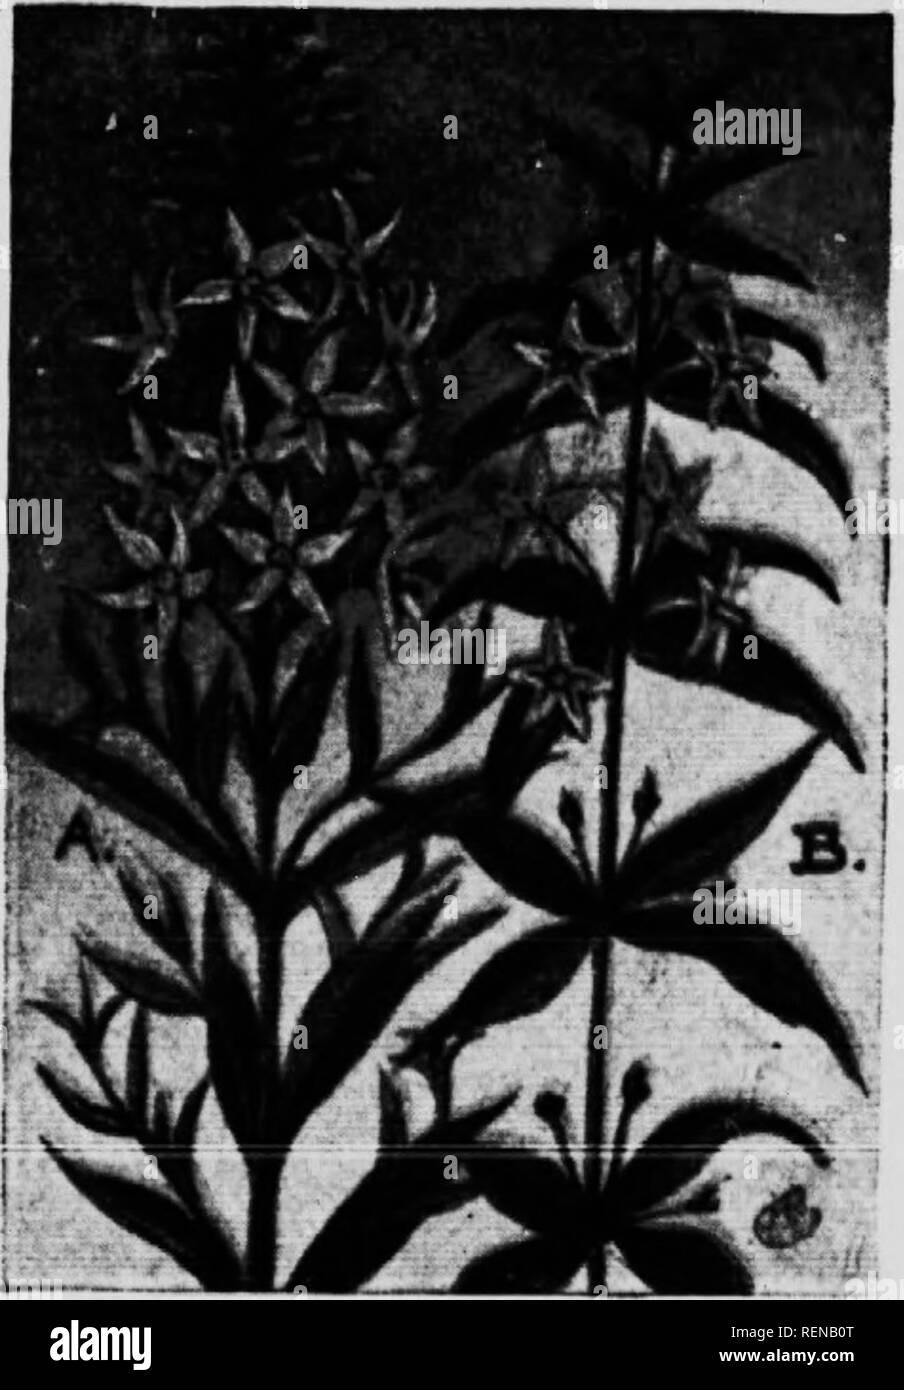 . [Microforme] guide de fleurs: fleurs sauvages à l'Est des Rocheuses. Fleurs; Fleurs; botanique; botanique. w. Famille PRIMROSE (t'riiiiifhirt II ) (A) Ykij.ow T,(&gt;(est. :sri;ii k i l.iixinKirlihi rcKtiis-en). Yolliiw iHisfstritc,T a un grand, ^Iniilcr siiiijili.' >ti'ni fniiii S Astuce:i4 pouces hi^HR. 'Ii,,. lancciilatc iMiiiitid me laisse-sti.'iiili'ss ai](l eniwiliMl aloi!- â… i,. tige. ritli niipiisitclv altcTiiately.T ou. , Tli. Ilâa... ., ,ike est l,âin et contient des nian.v , sIimkIit lanls.n,  j.iliccls tlicv; (.pen dans le ImjI- toiM ot till, spiki. upwanls. Kai'li ll,mi.r a vivre, nninteil p Banque D'Images